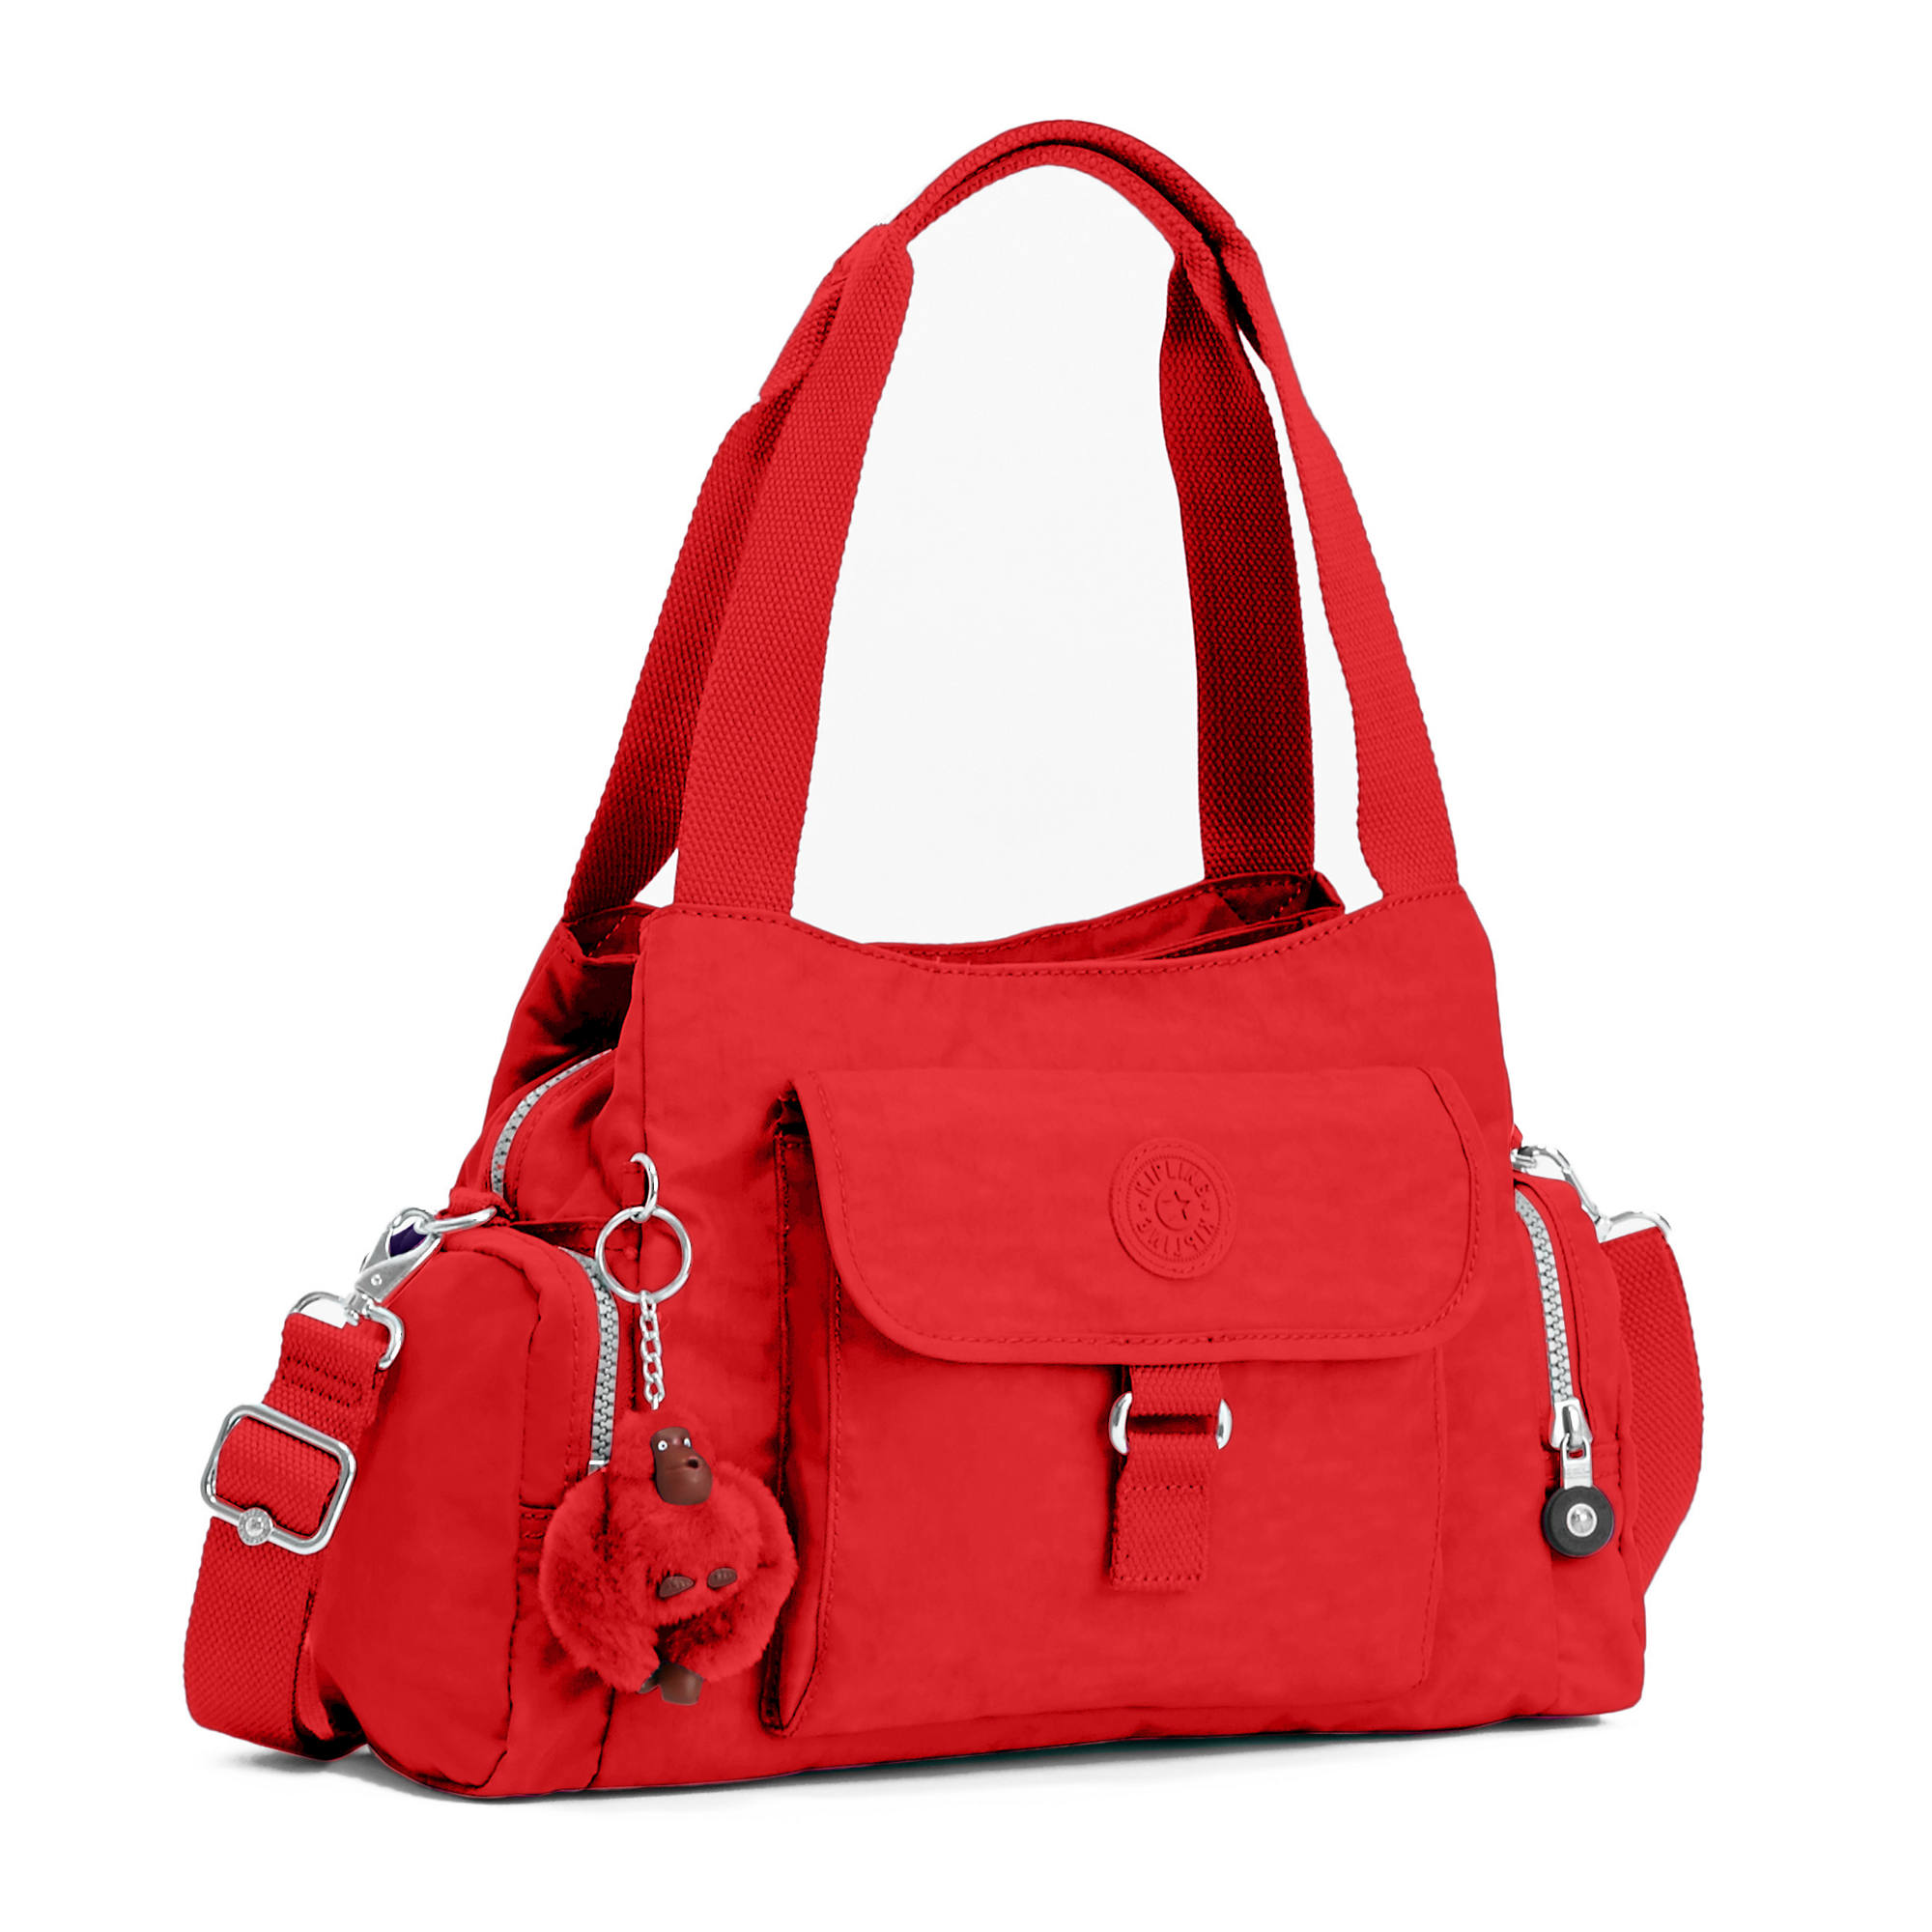 Kipling-Felix-Large-Handbag miniature 17